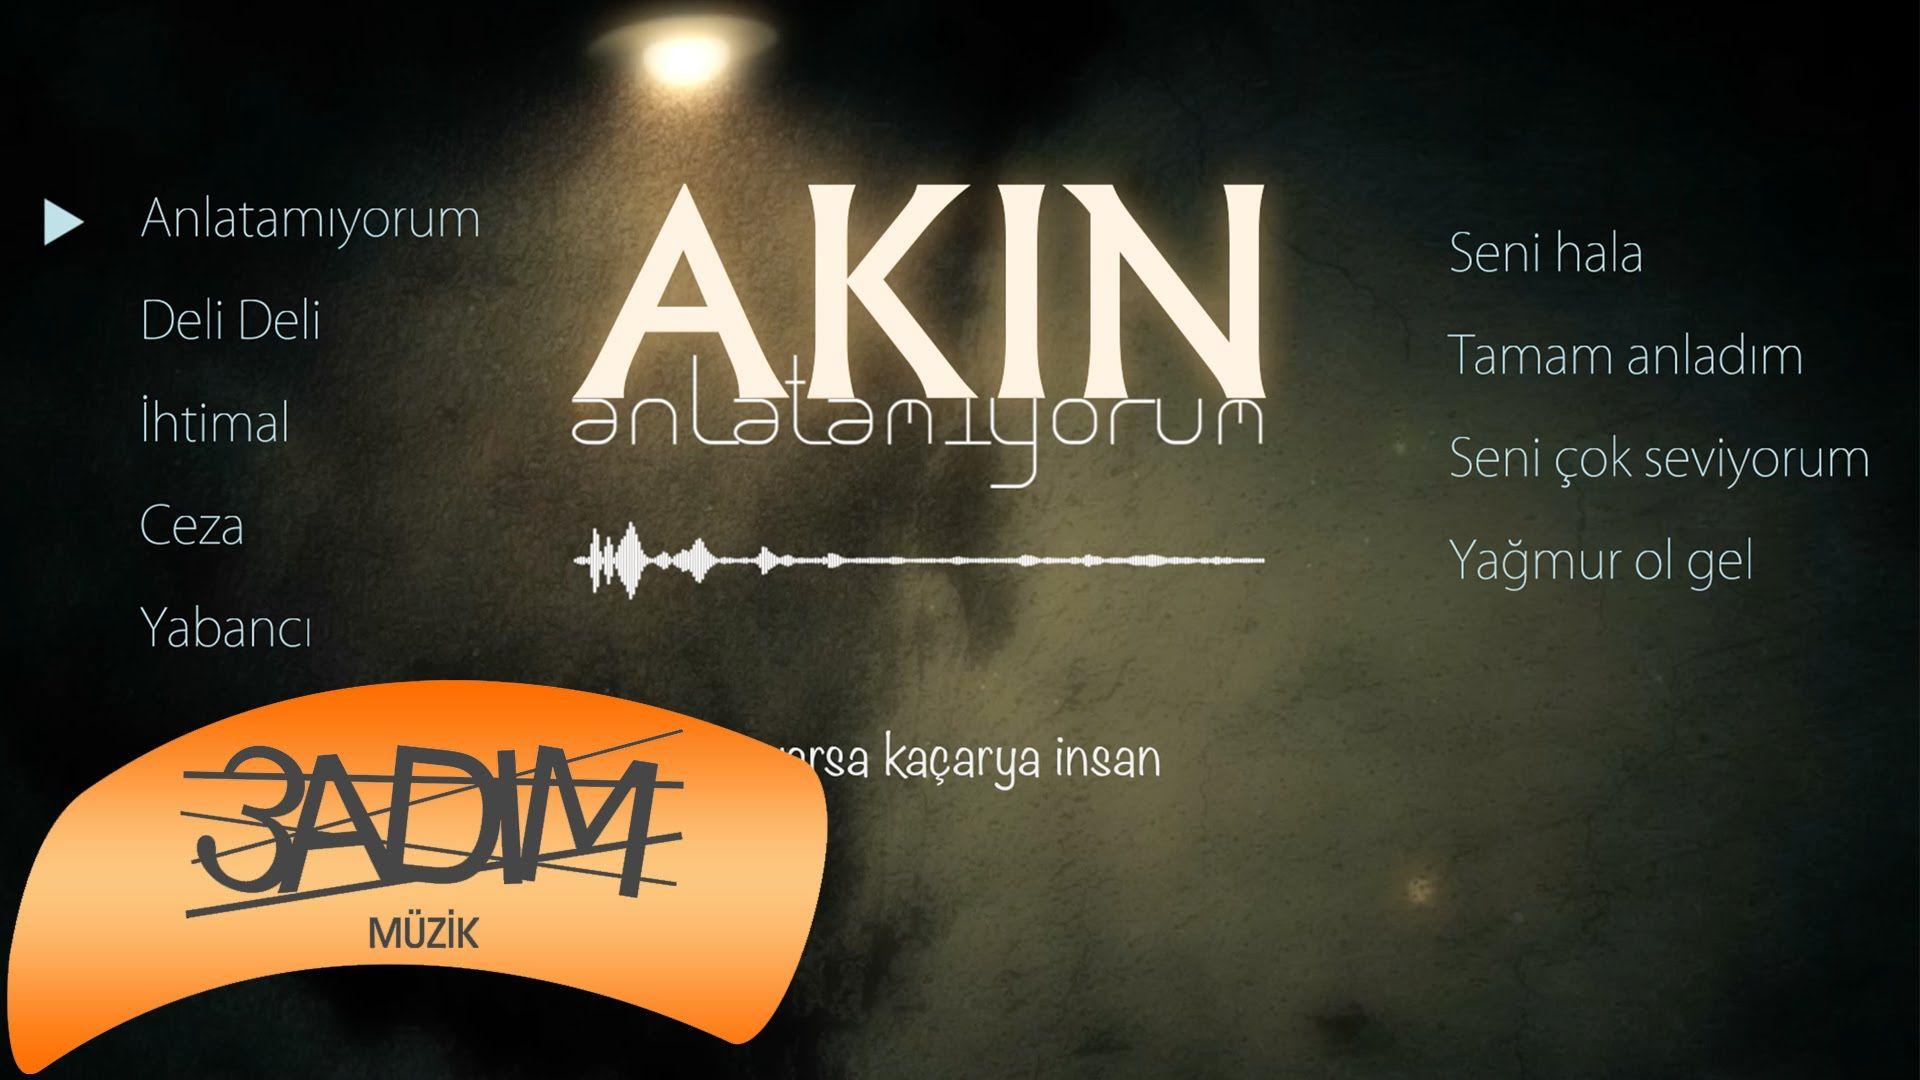 Akin Anlatamiyorum Official Lyric Video Lyrics Video Movie Posters